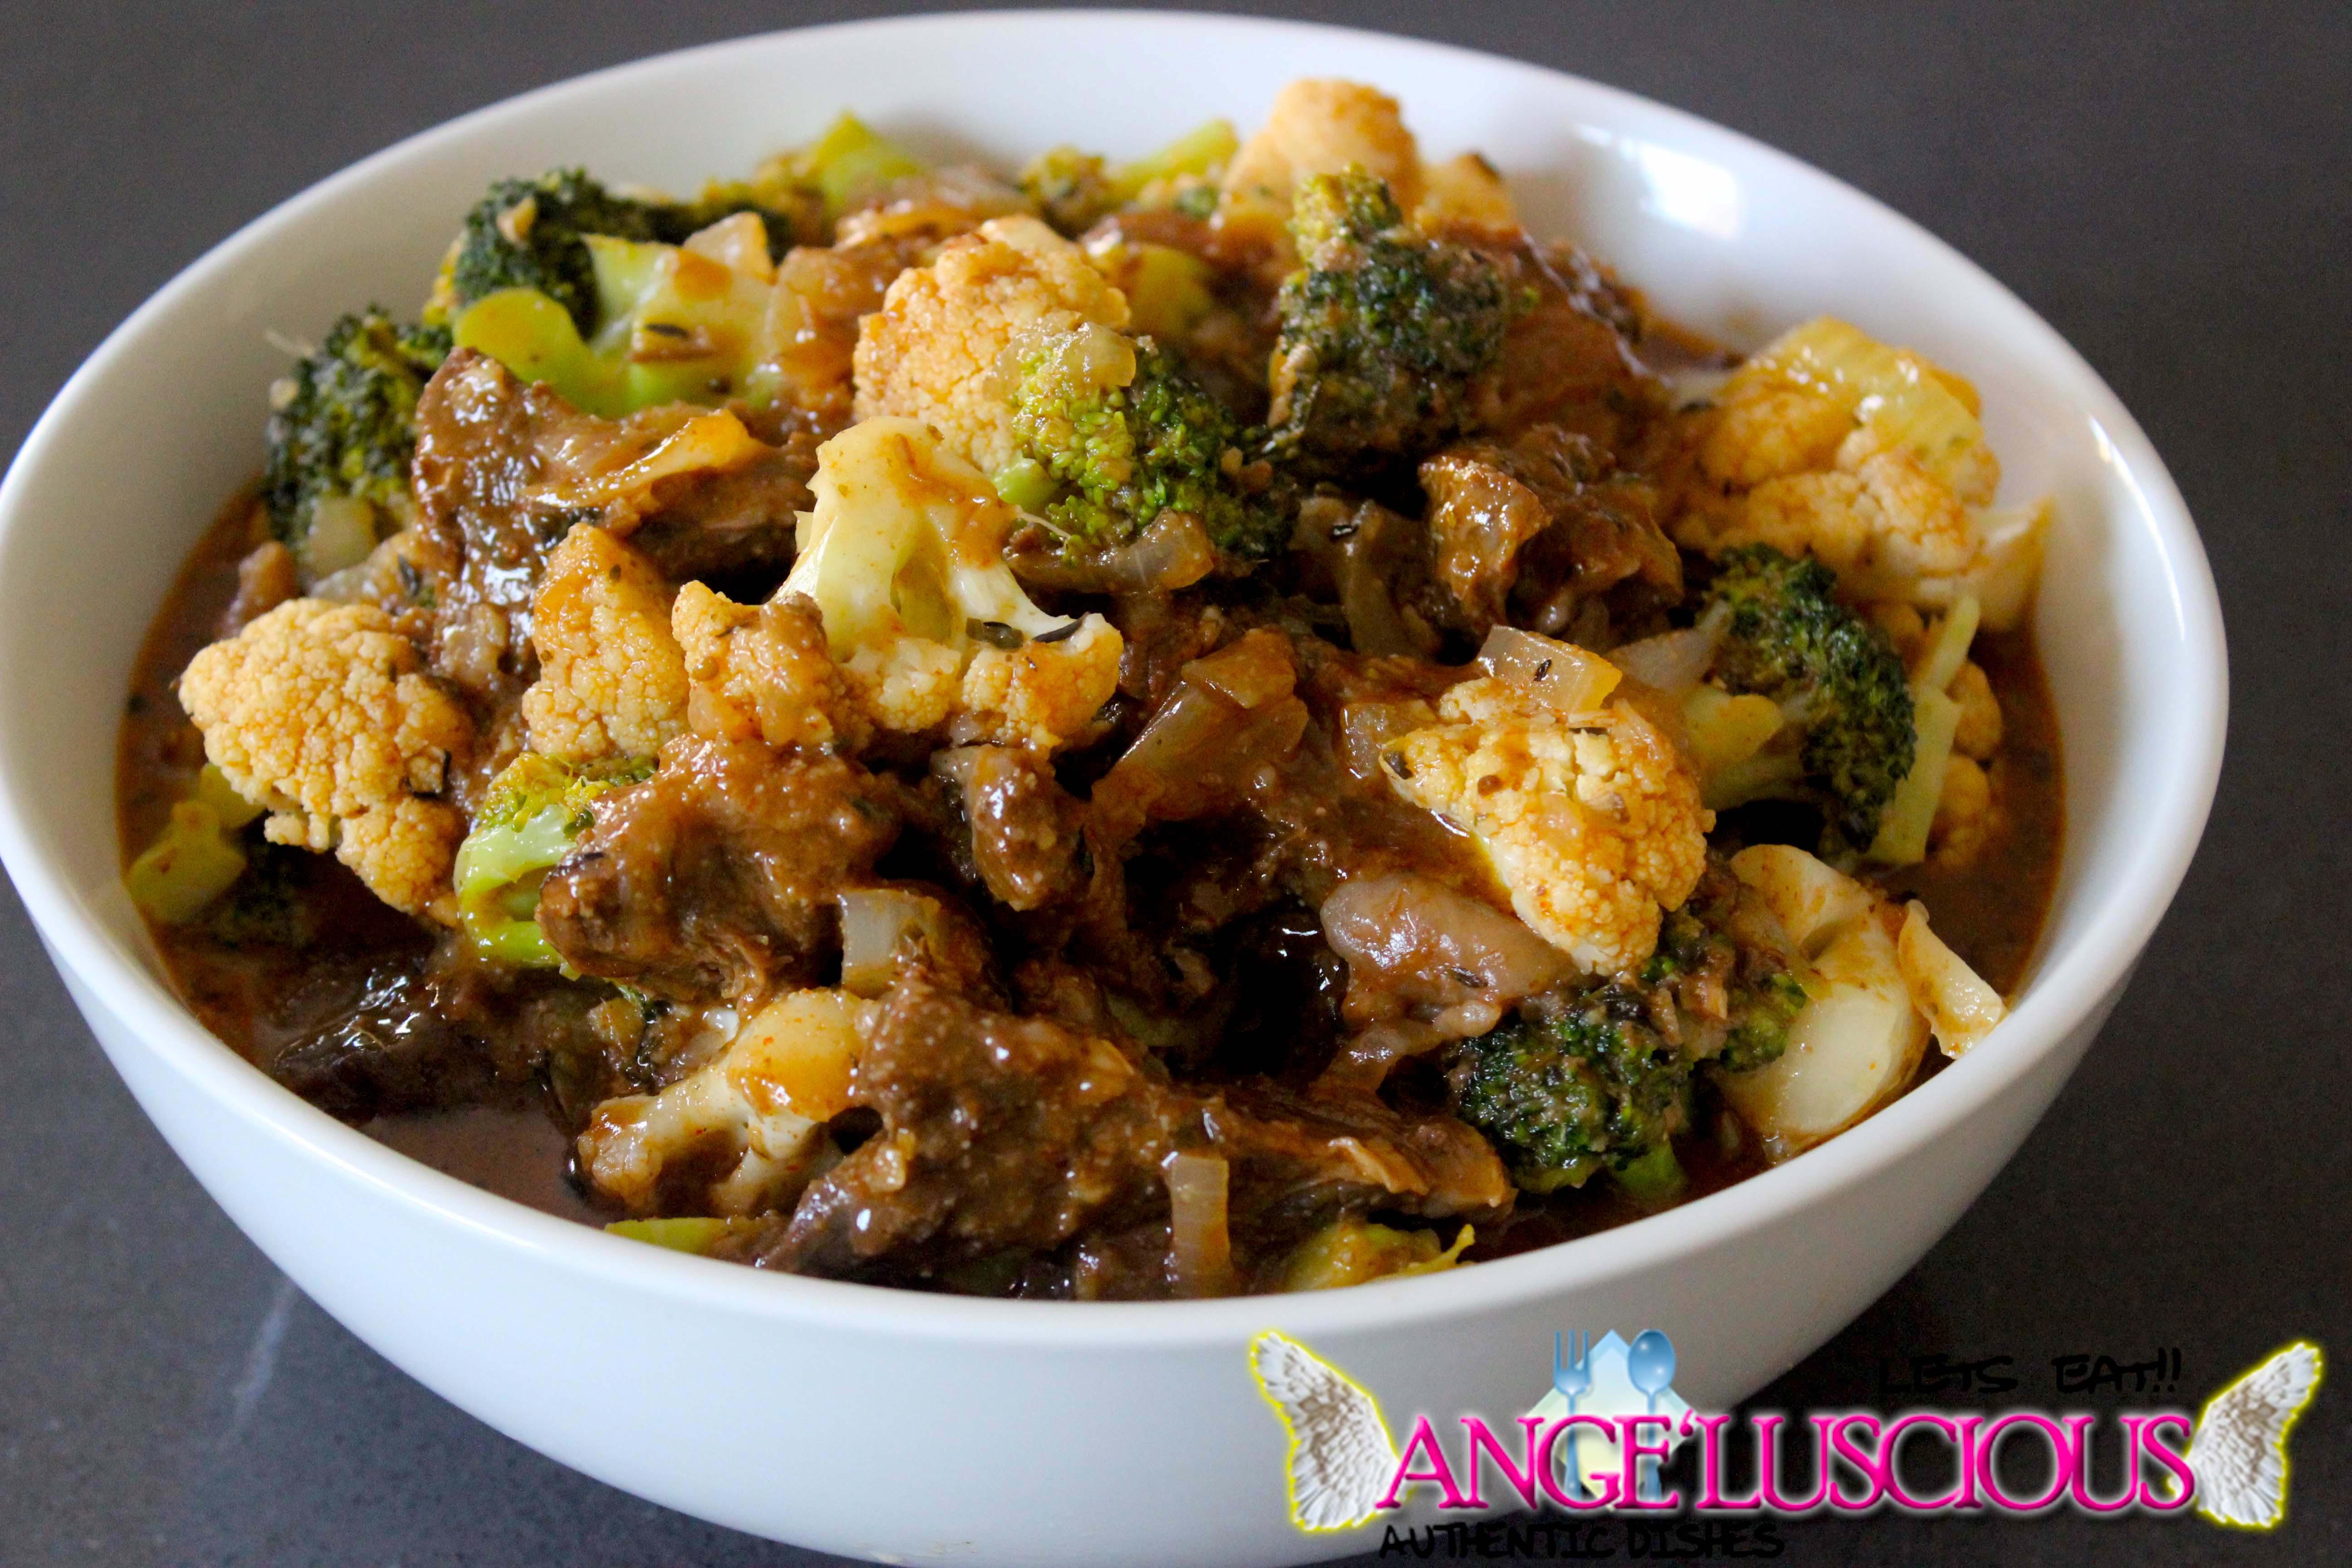 Braised Beef Chuck Roast with Broccoli and Cauliflower - Angeluscious